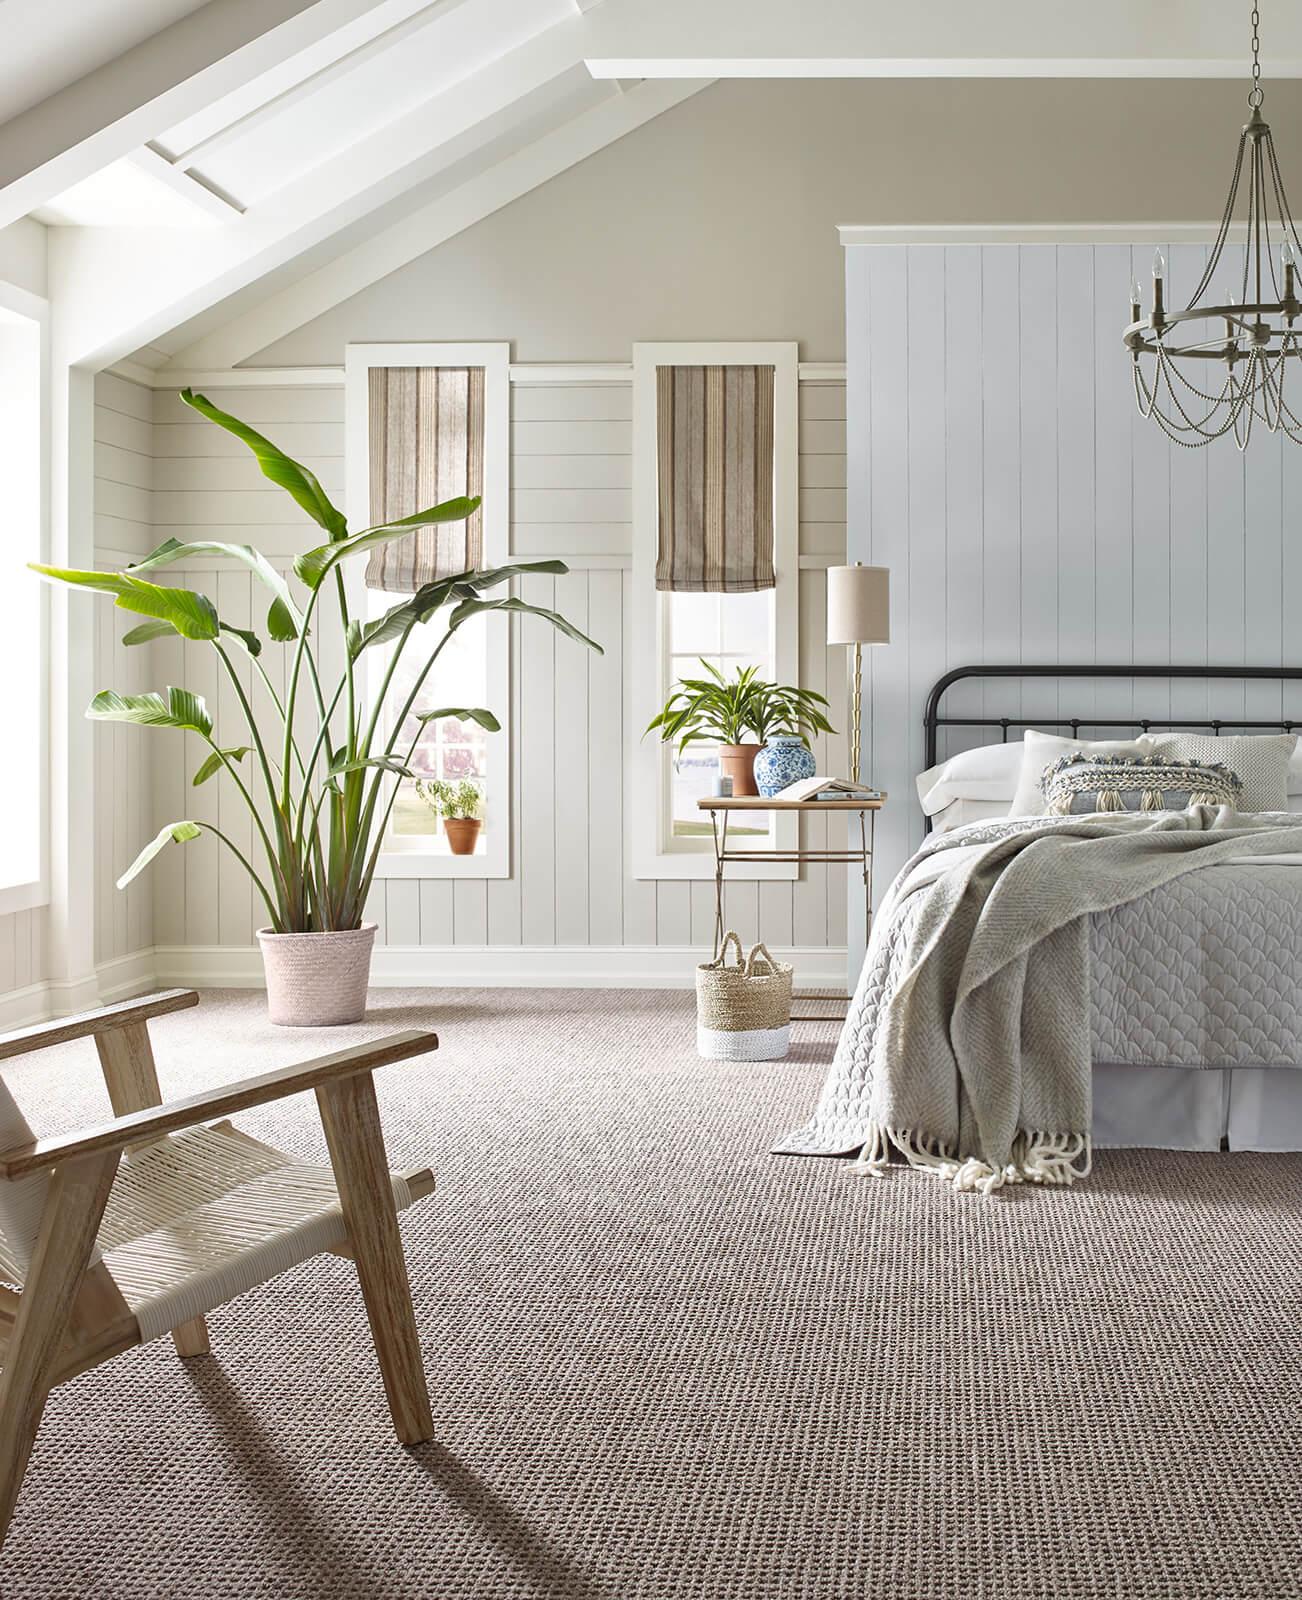 Classic style carpet for bedroom | Atlanta Flooring Design Centers Inc